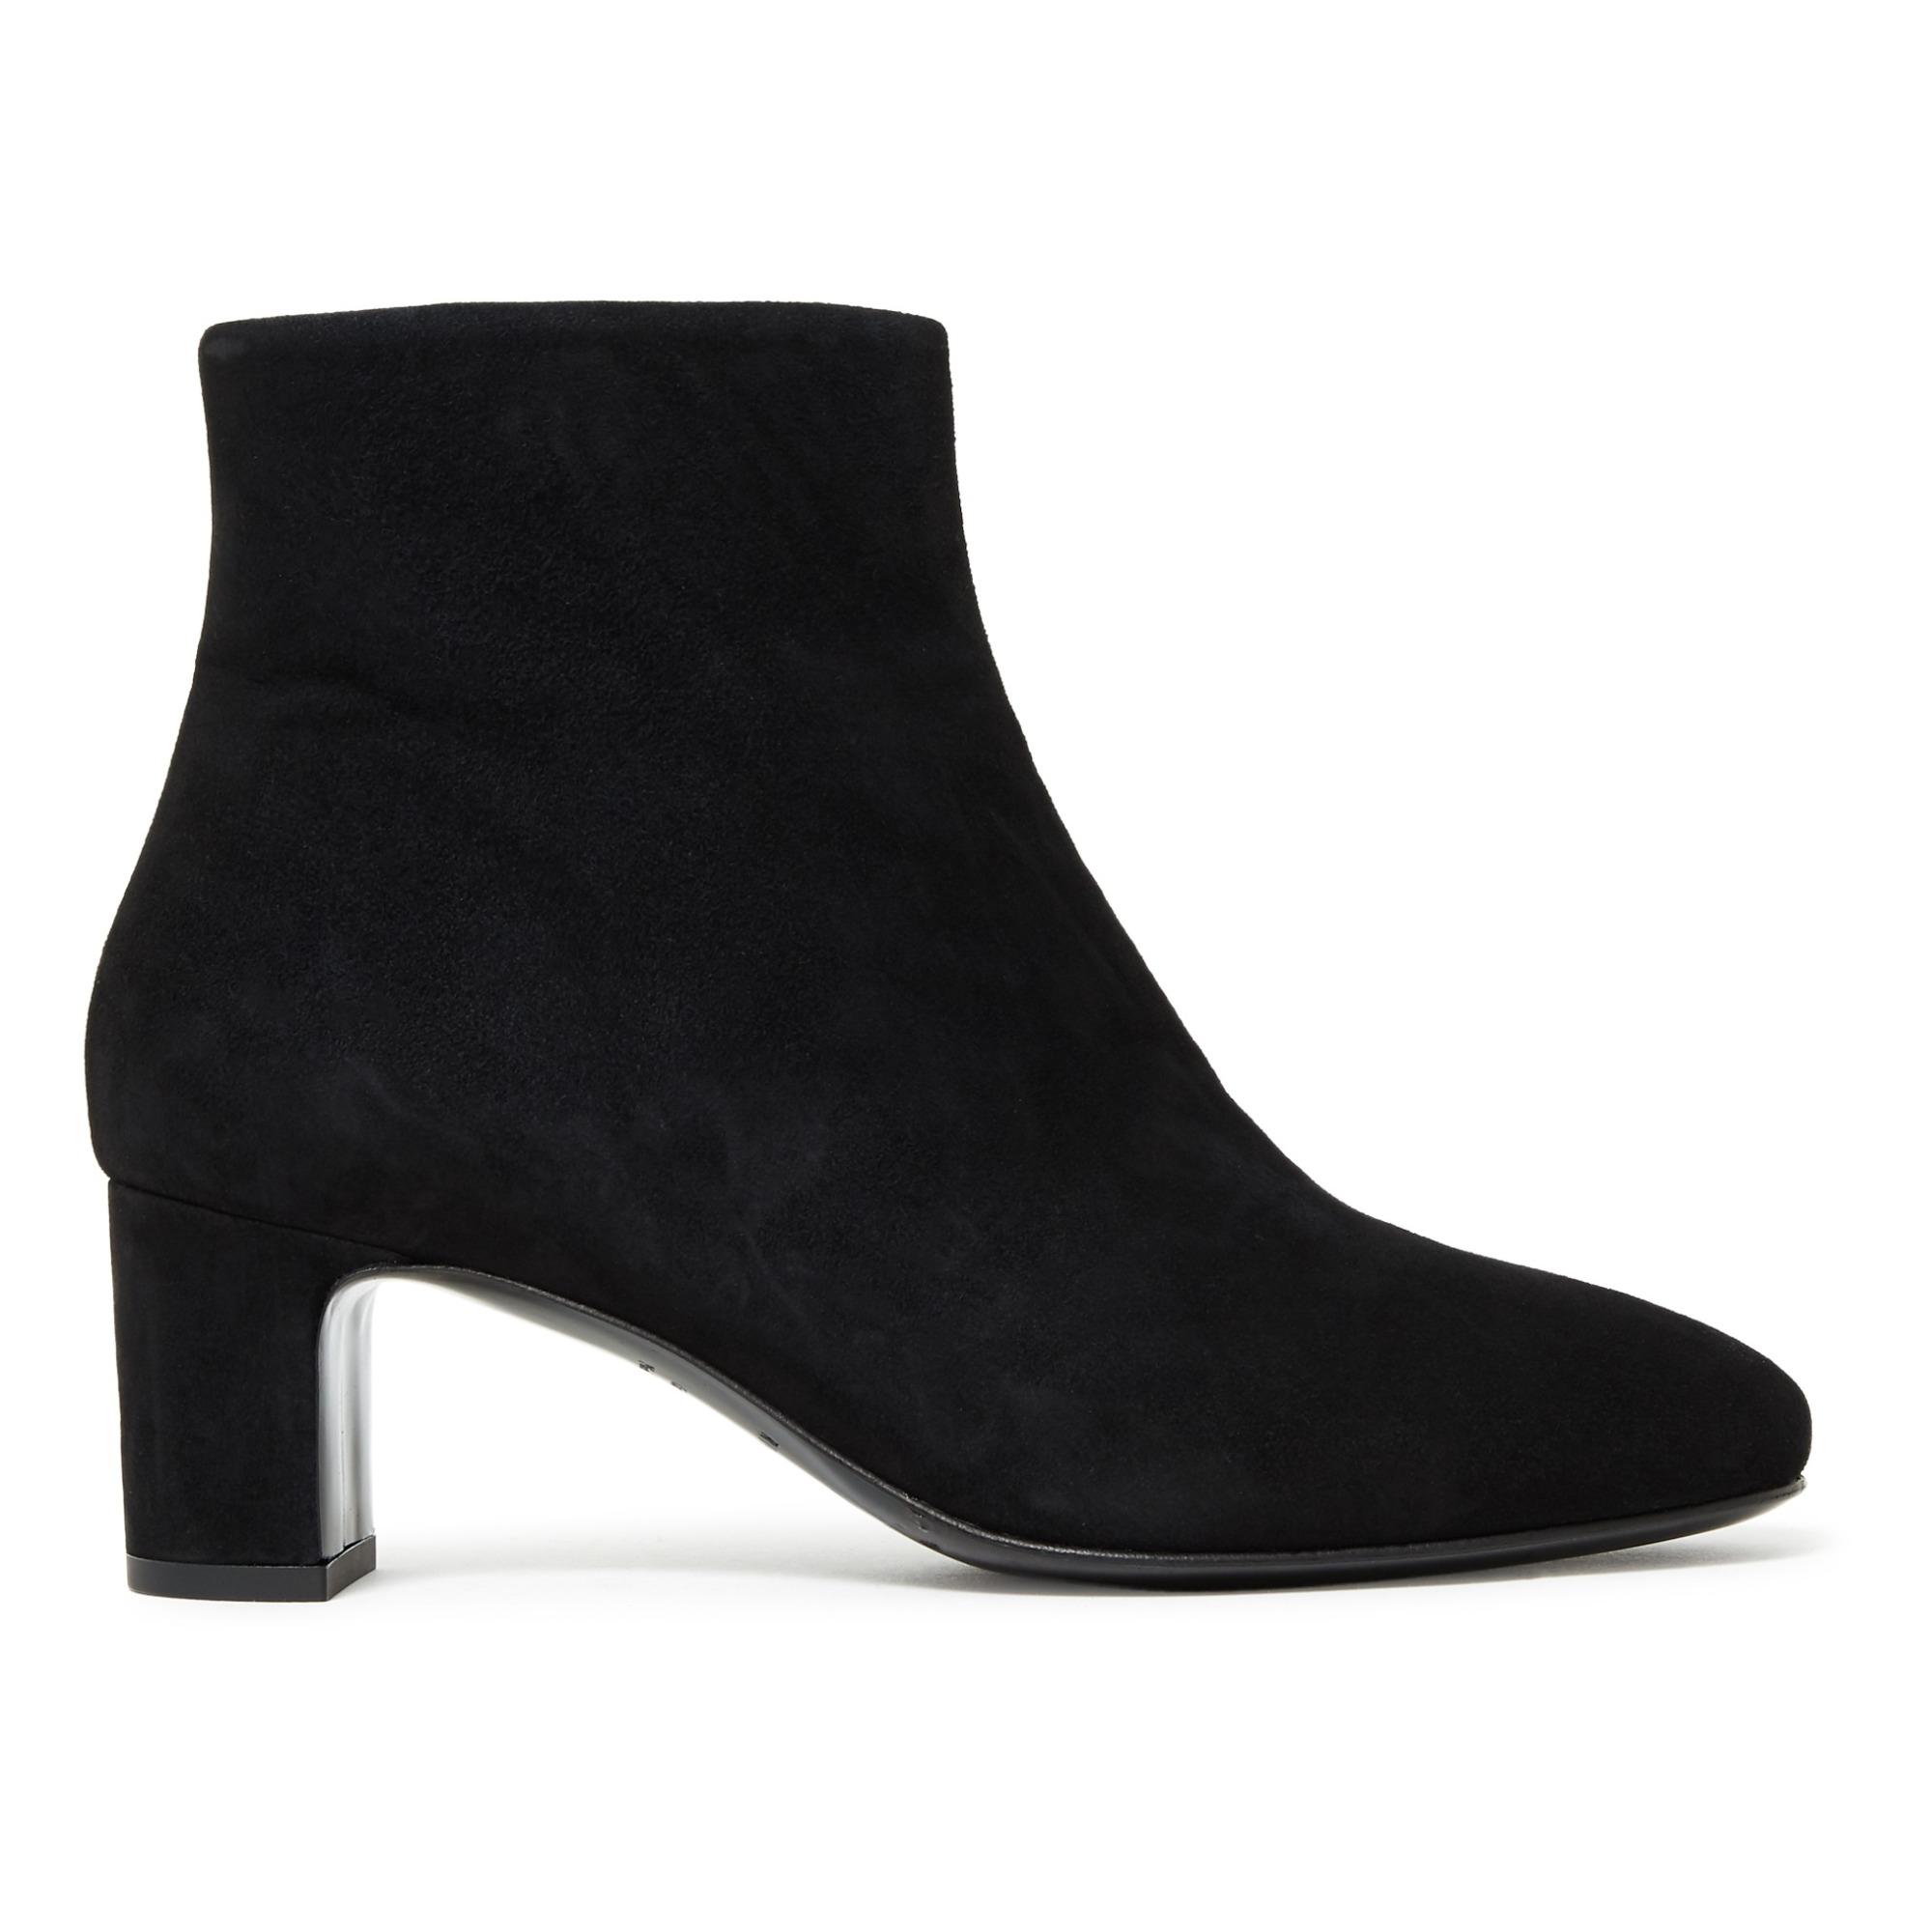 Nâ°290 Velvet Kid Leather Ankle Boots